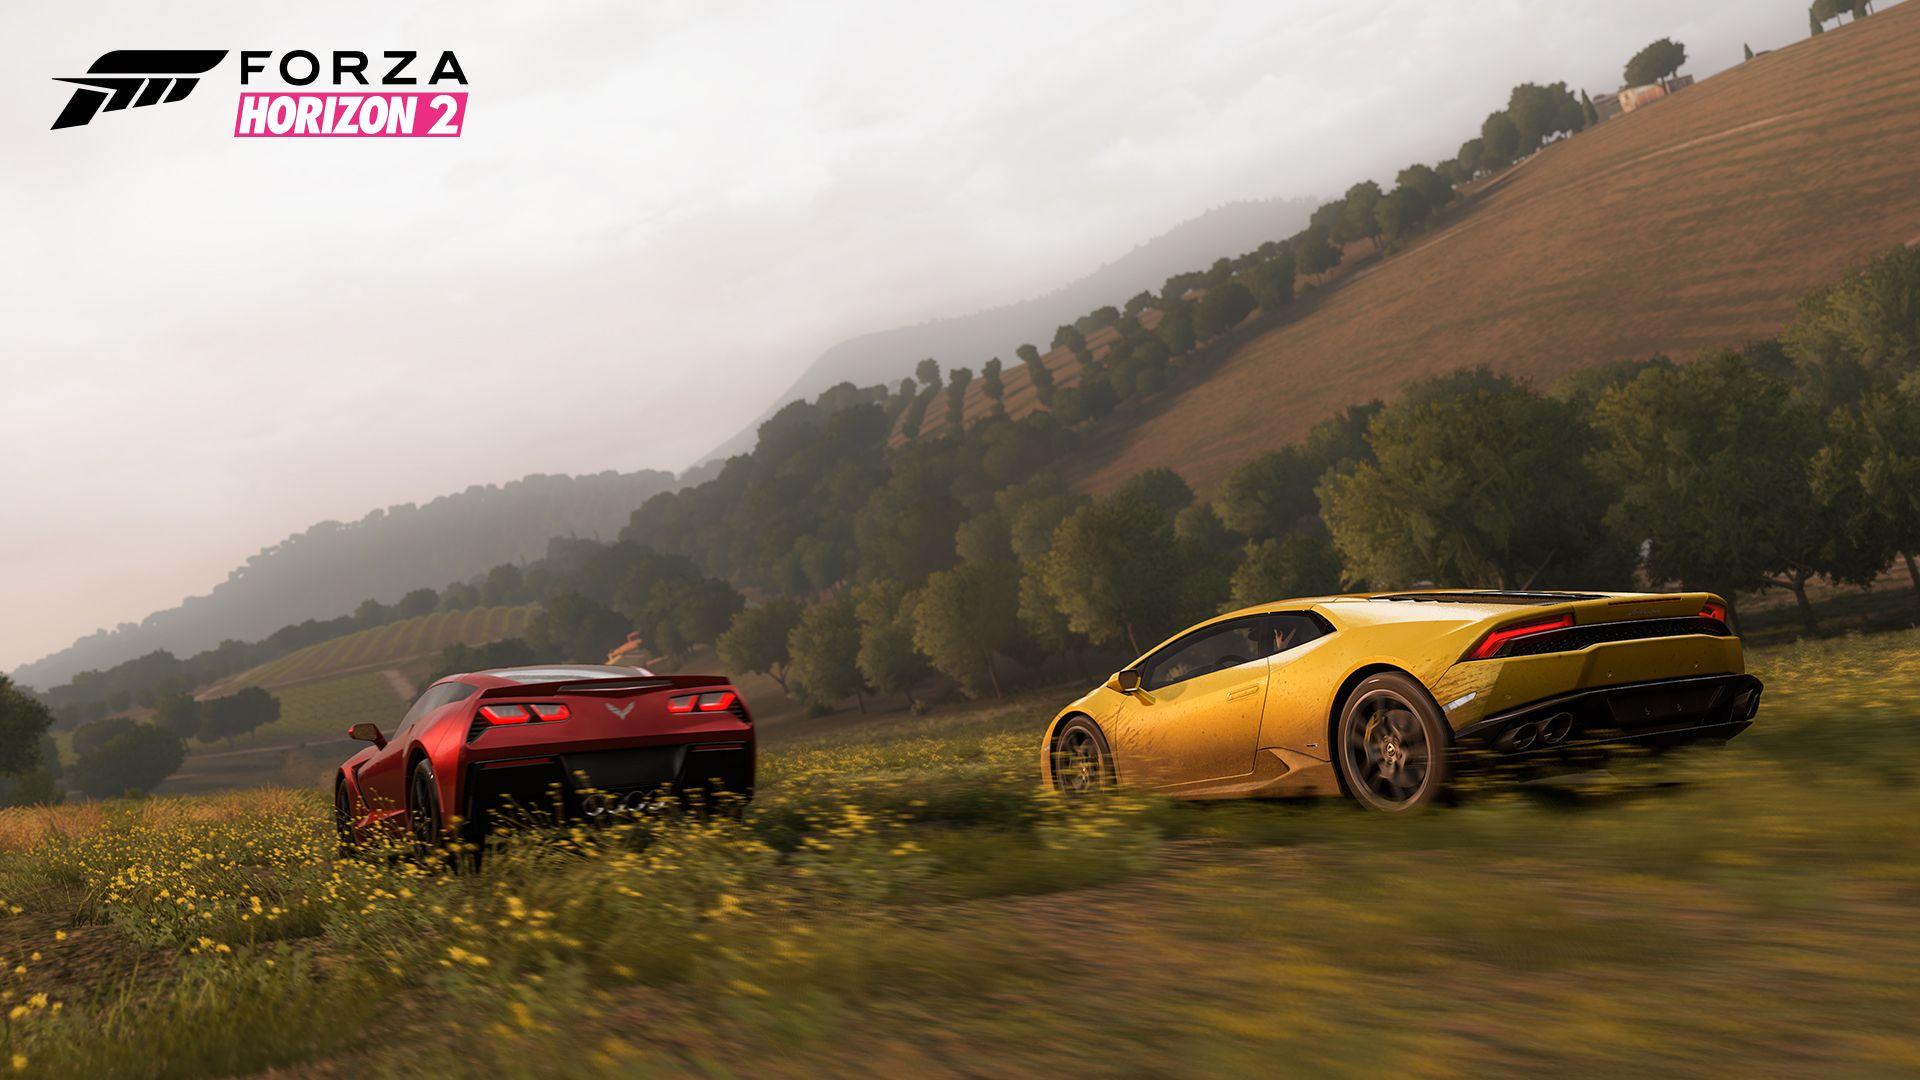 Forza Horizon 2 gare